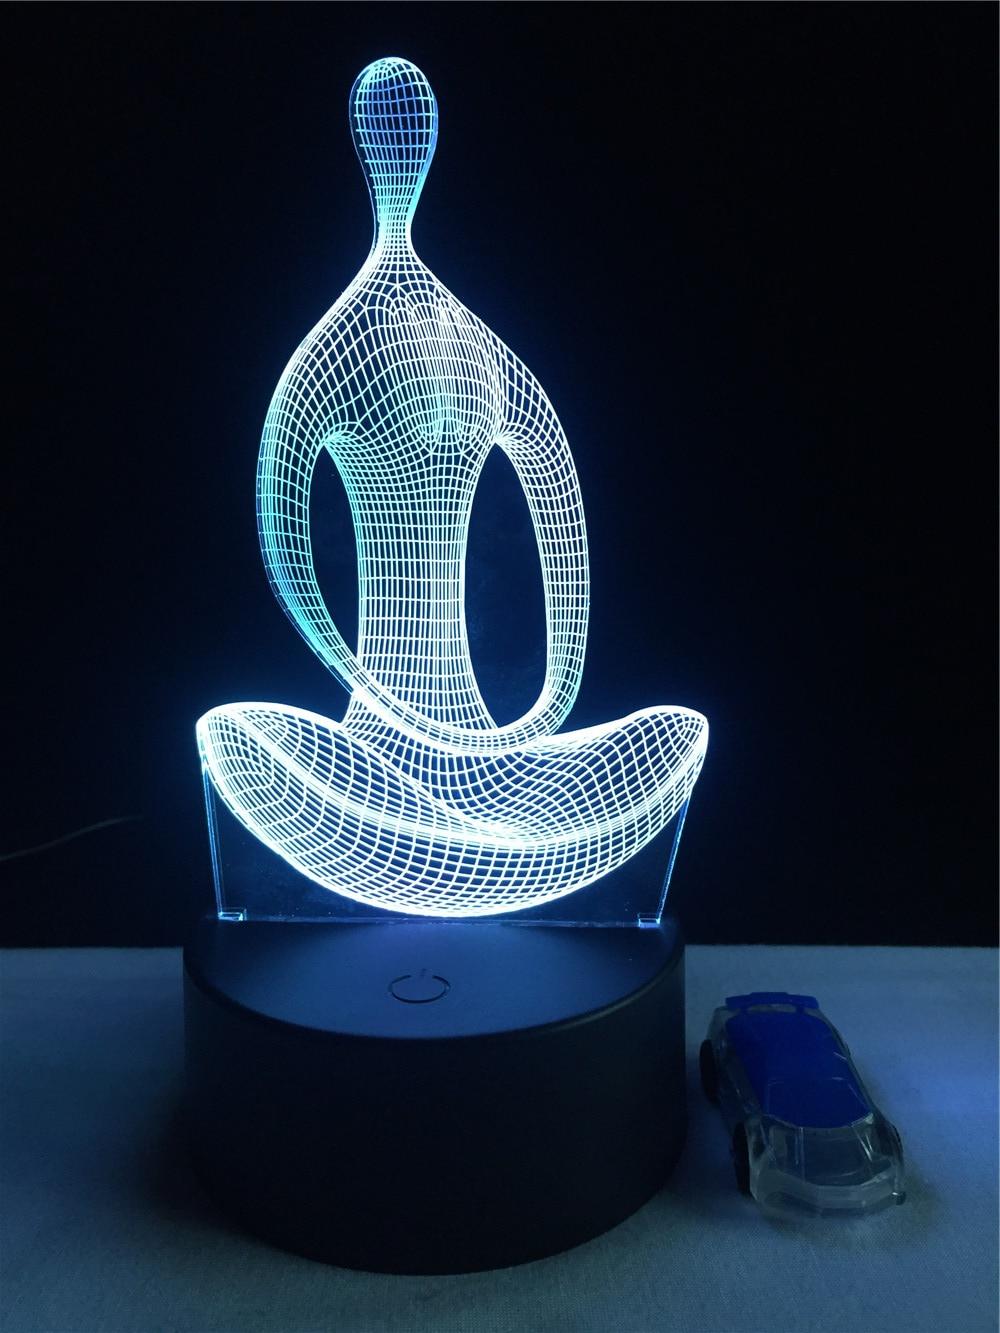 Luzes da Noite 3d 7 mudando a cor Function 3 : Stage Lighting Effect/wedding Decor/house Decoration